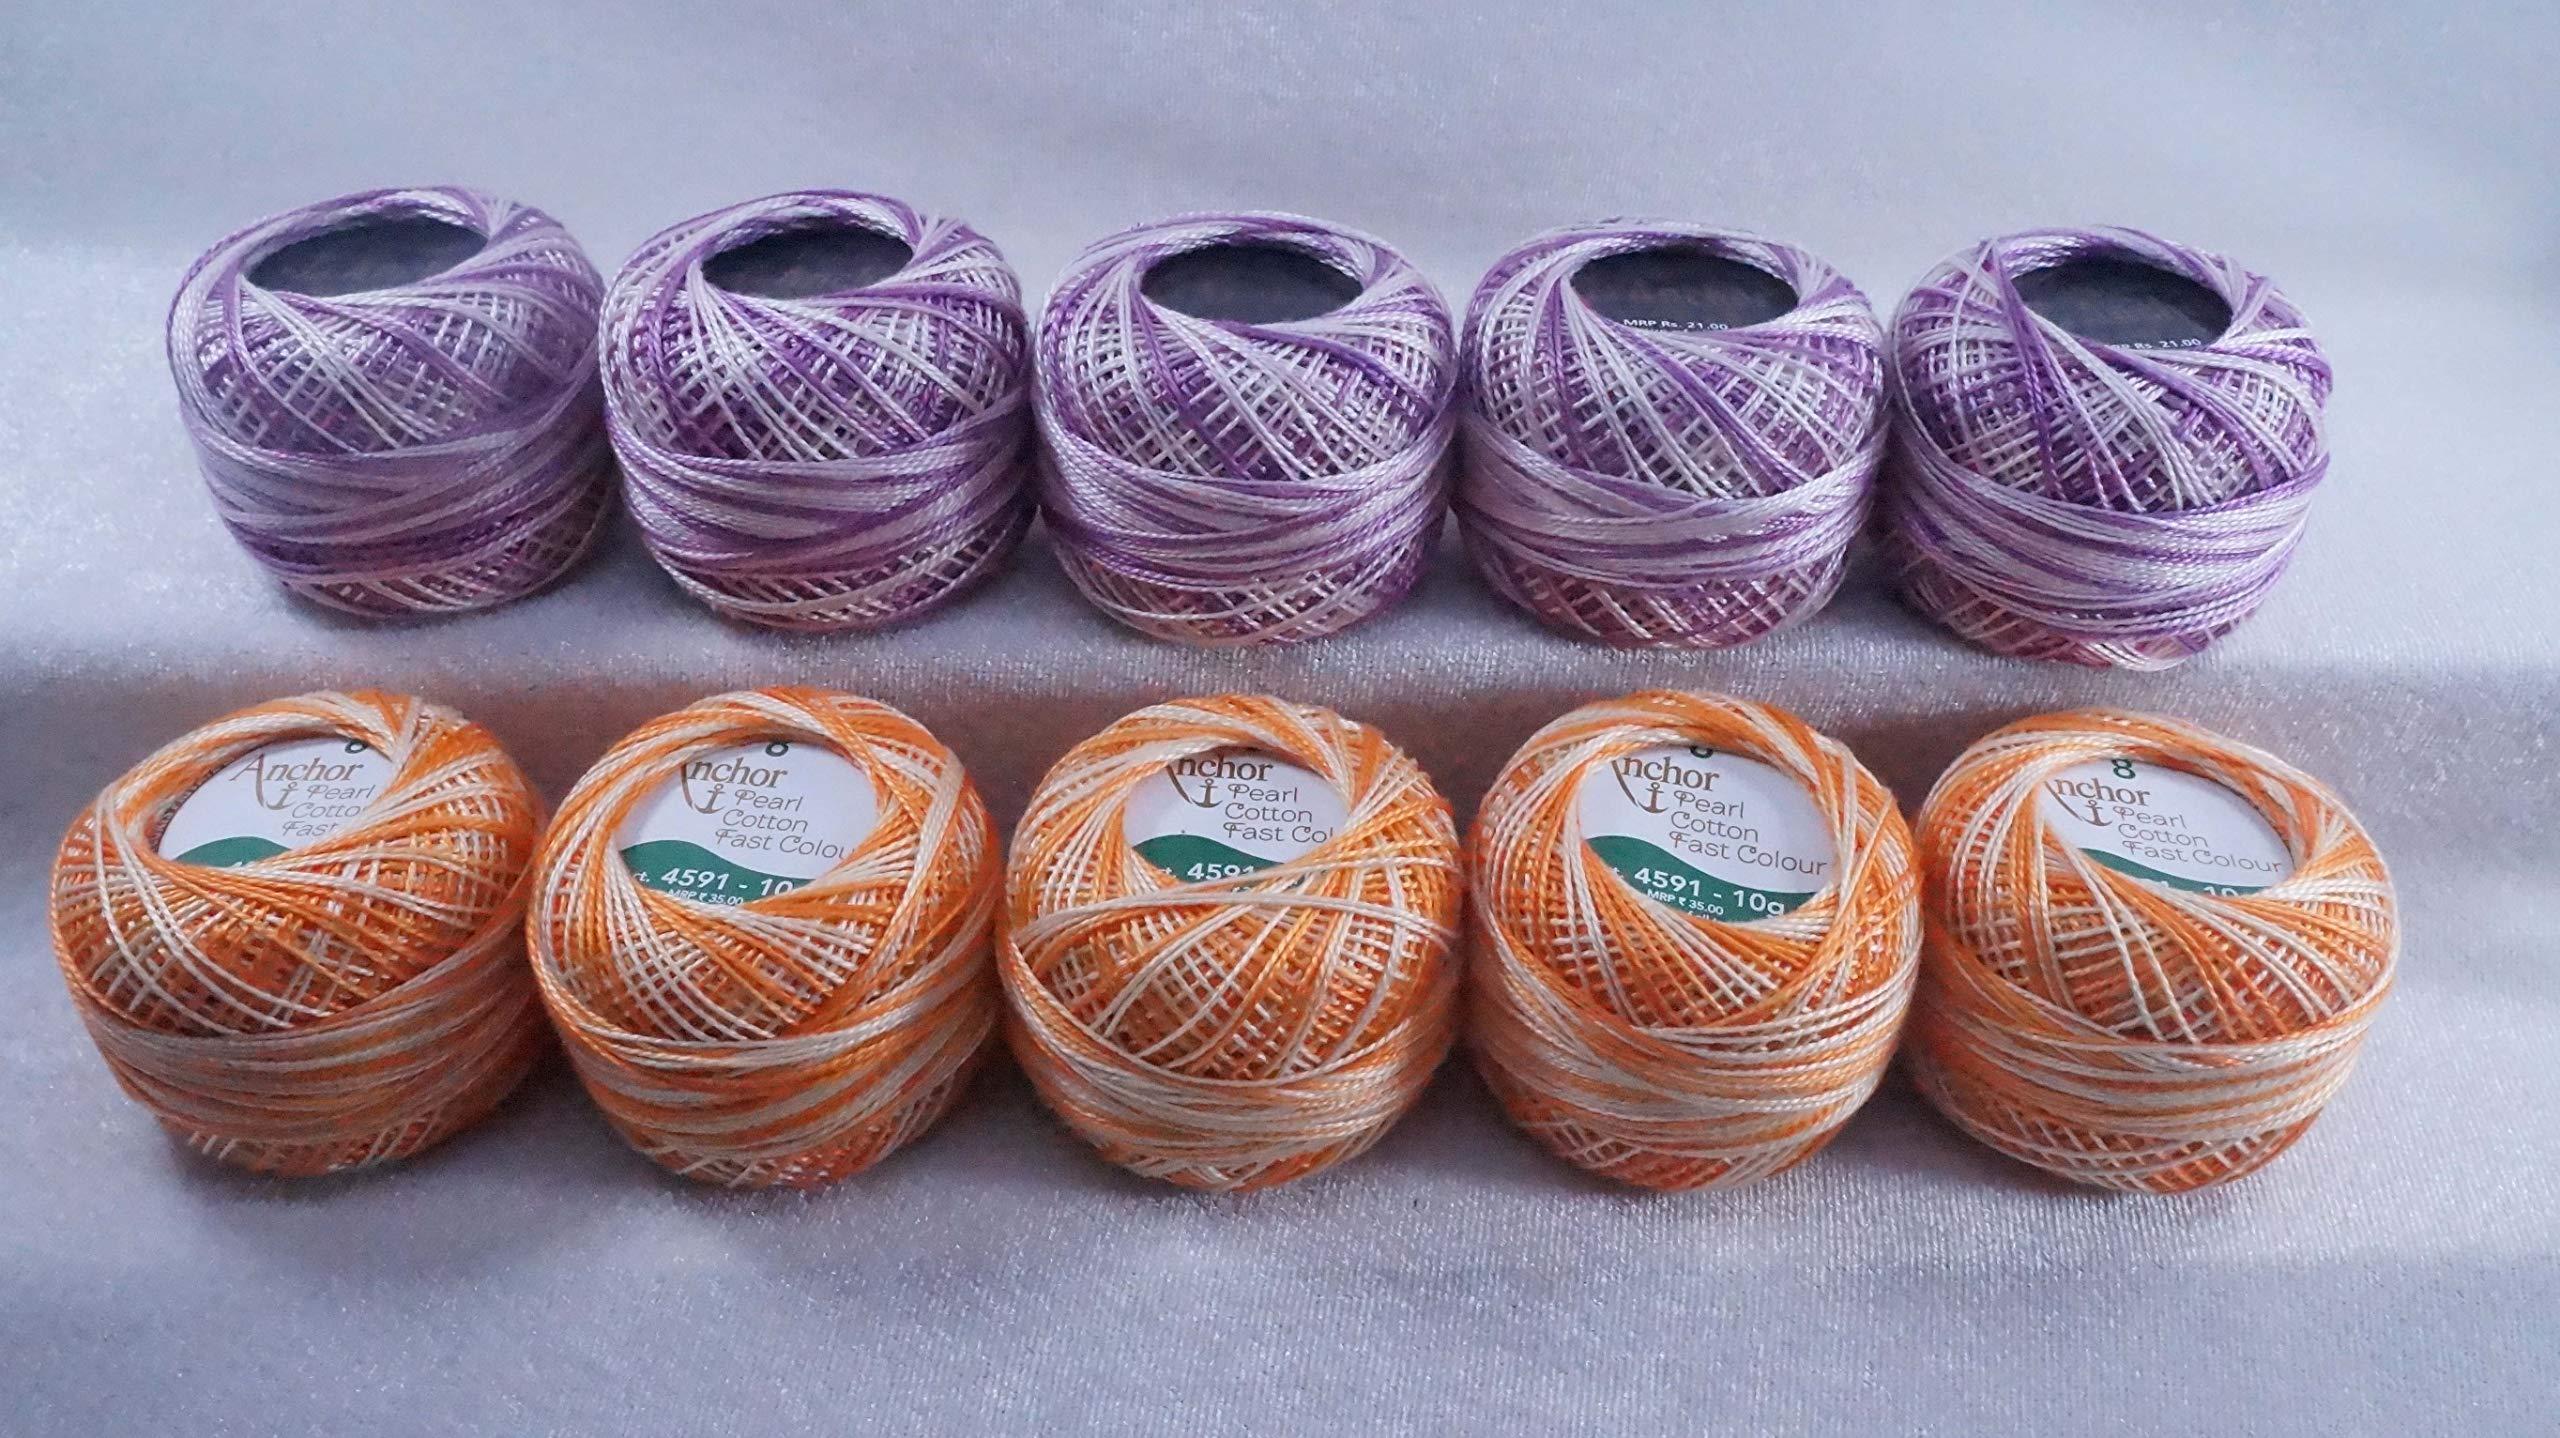 10 Pcs Violat & Orange Cotton Anchor Thread Mercerized Yarn Craft Knitting Tatting Skein